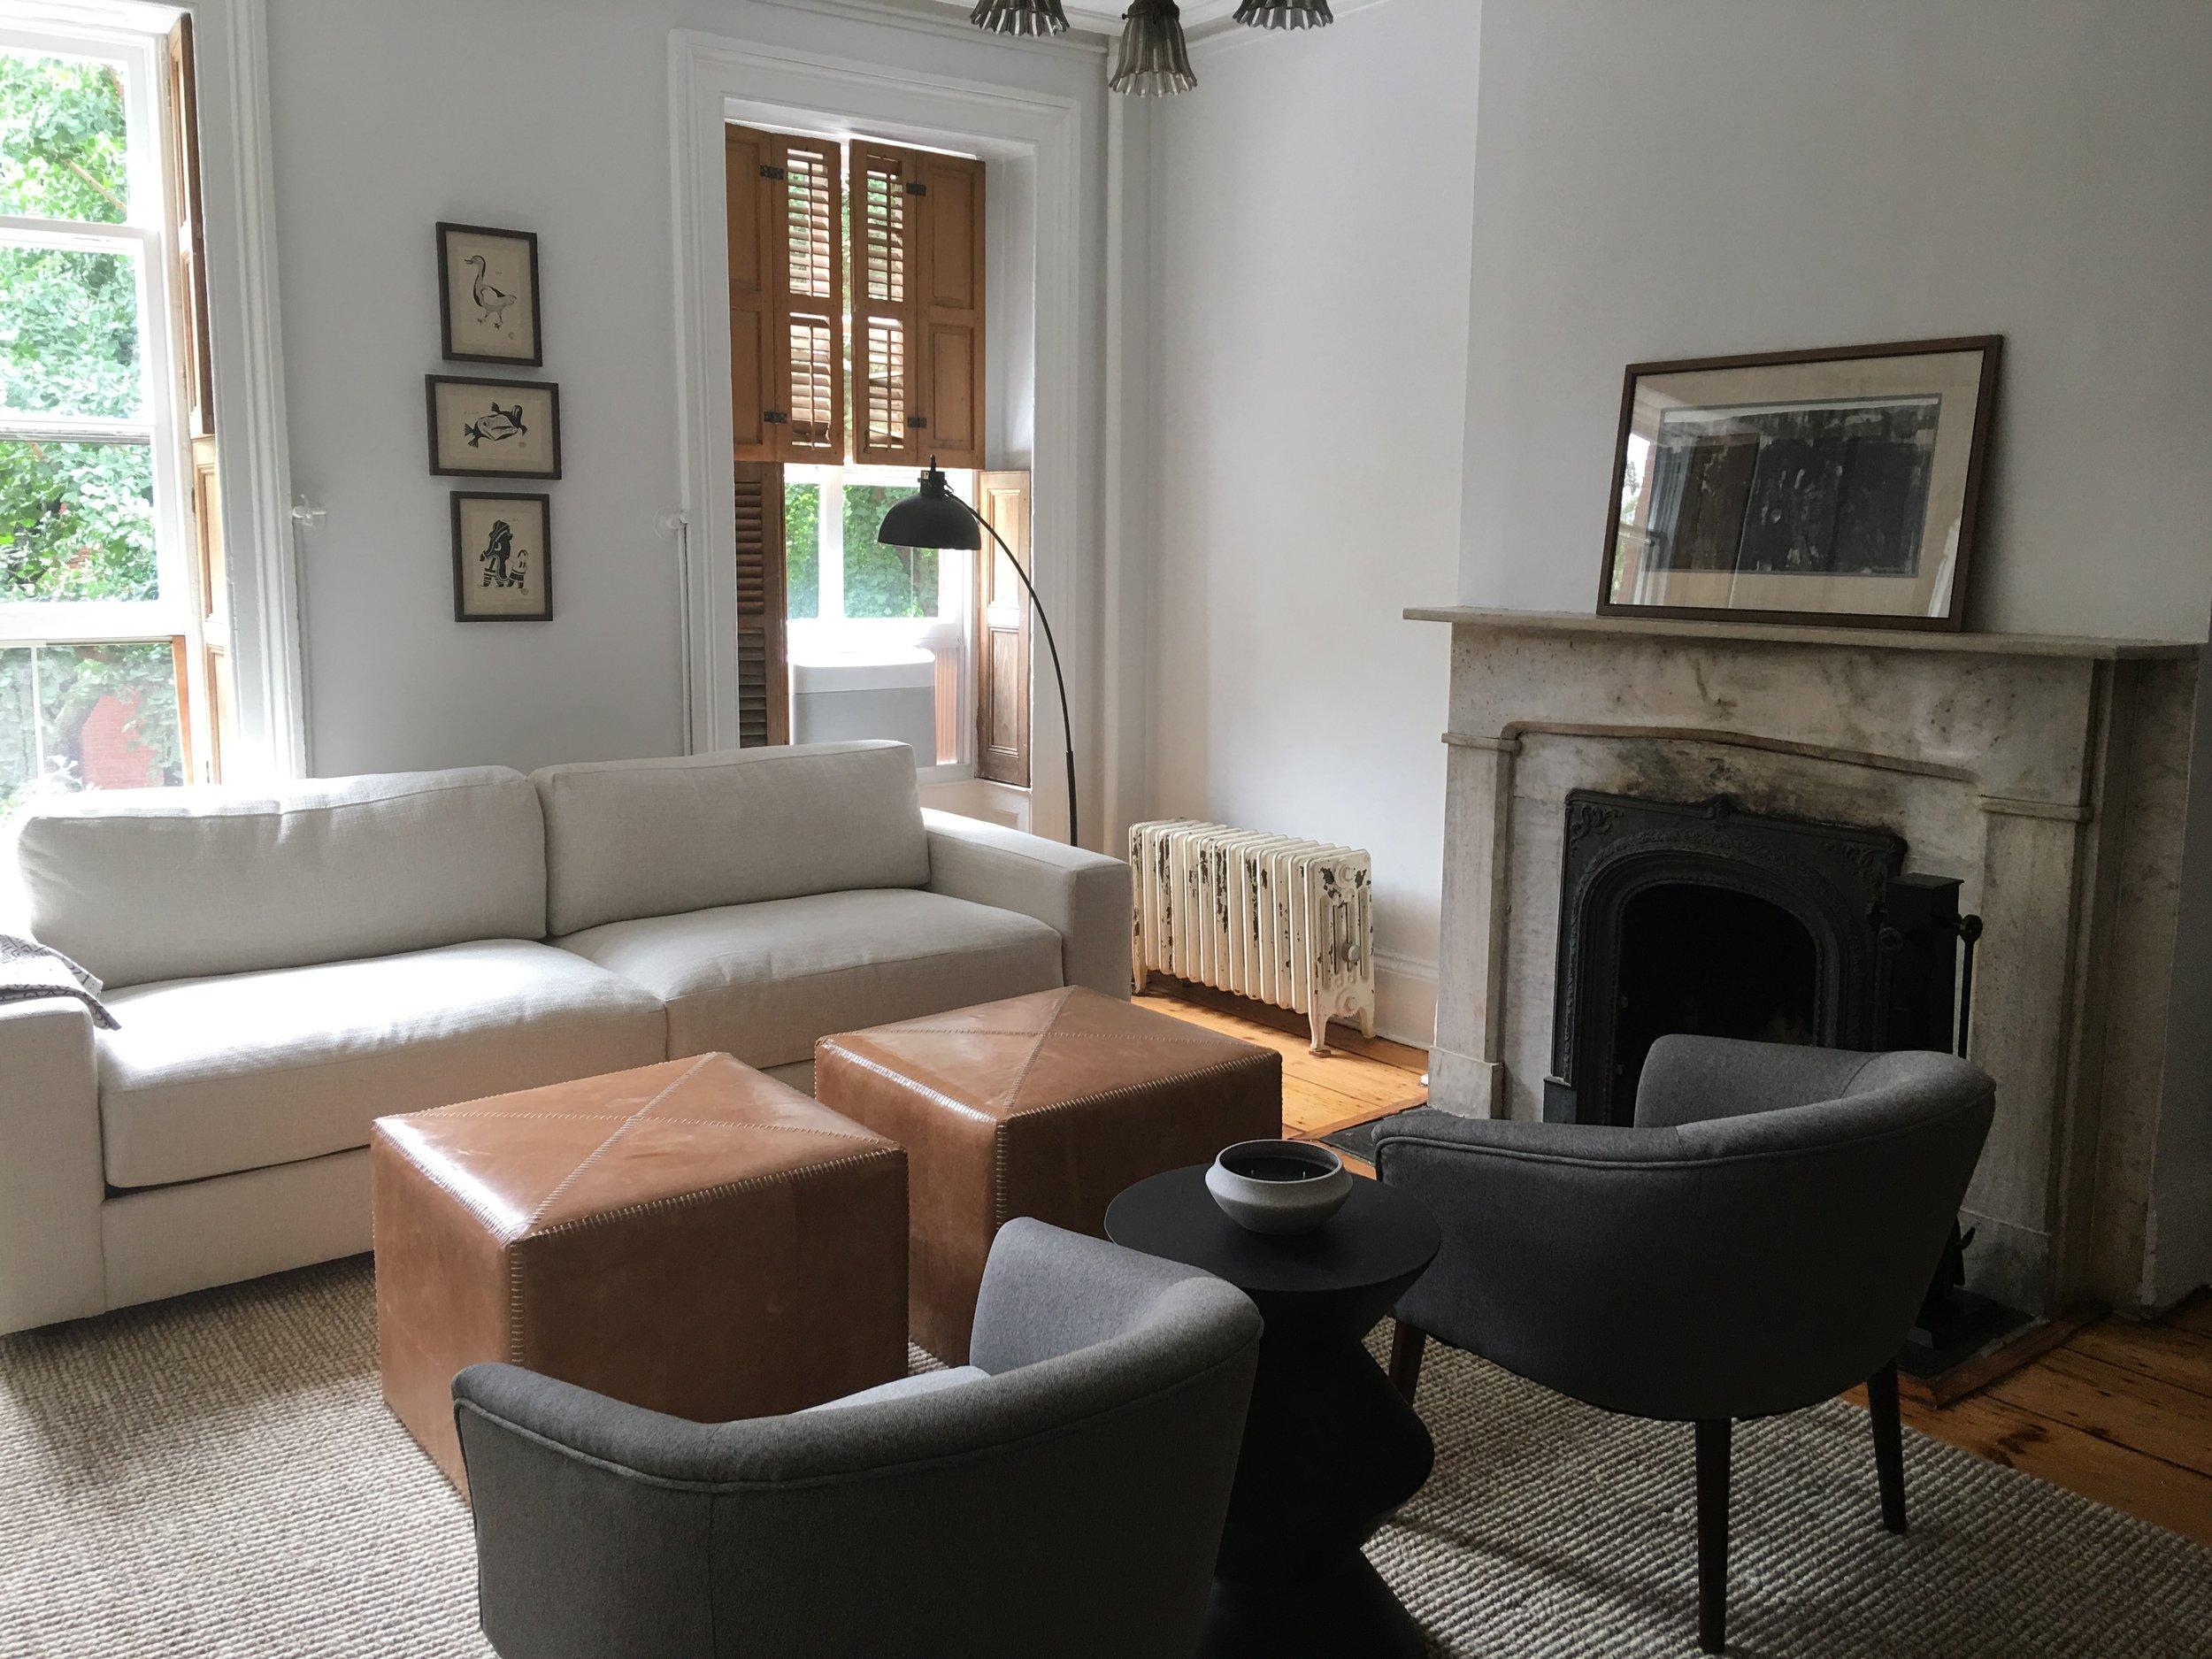 Boerum Hill Apartment (in progress)